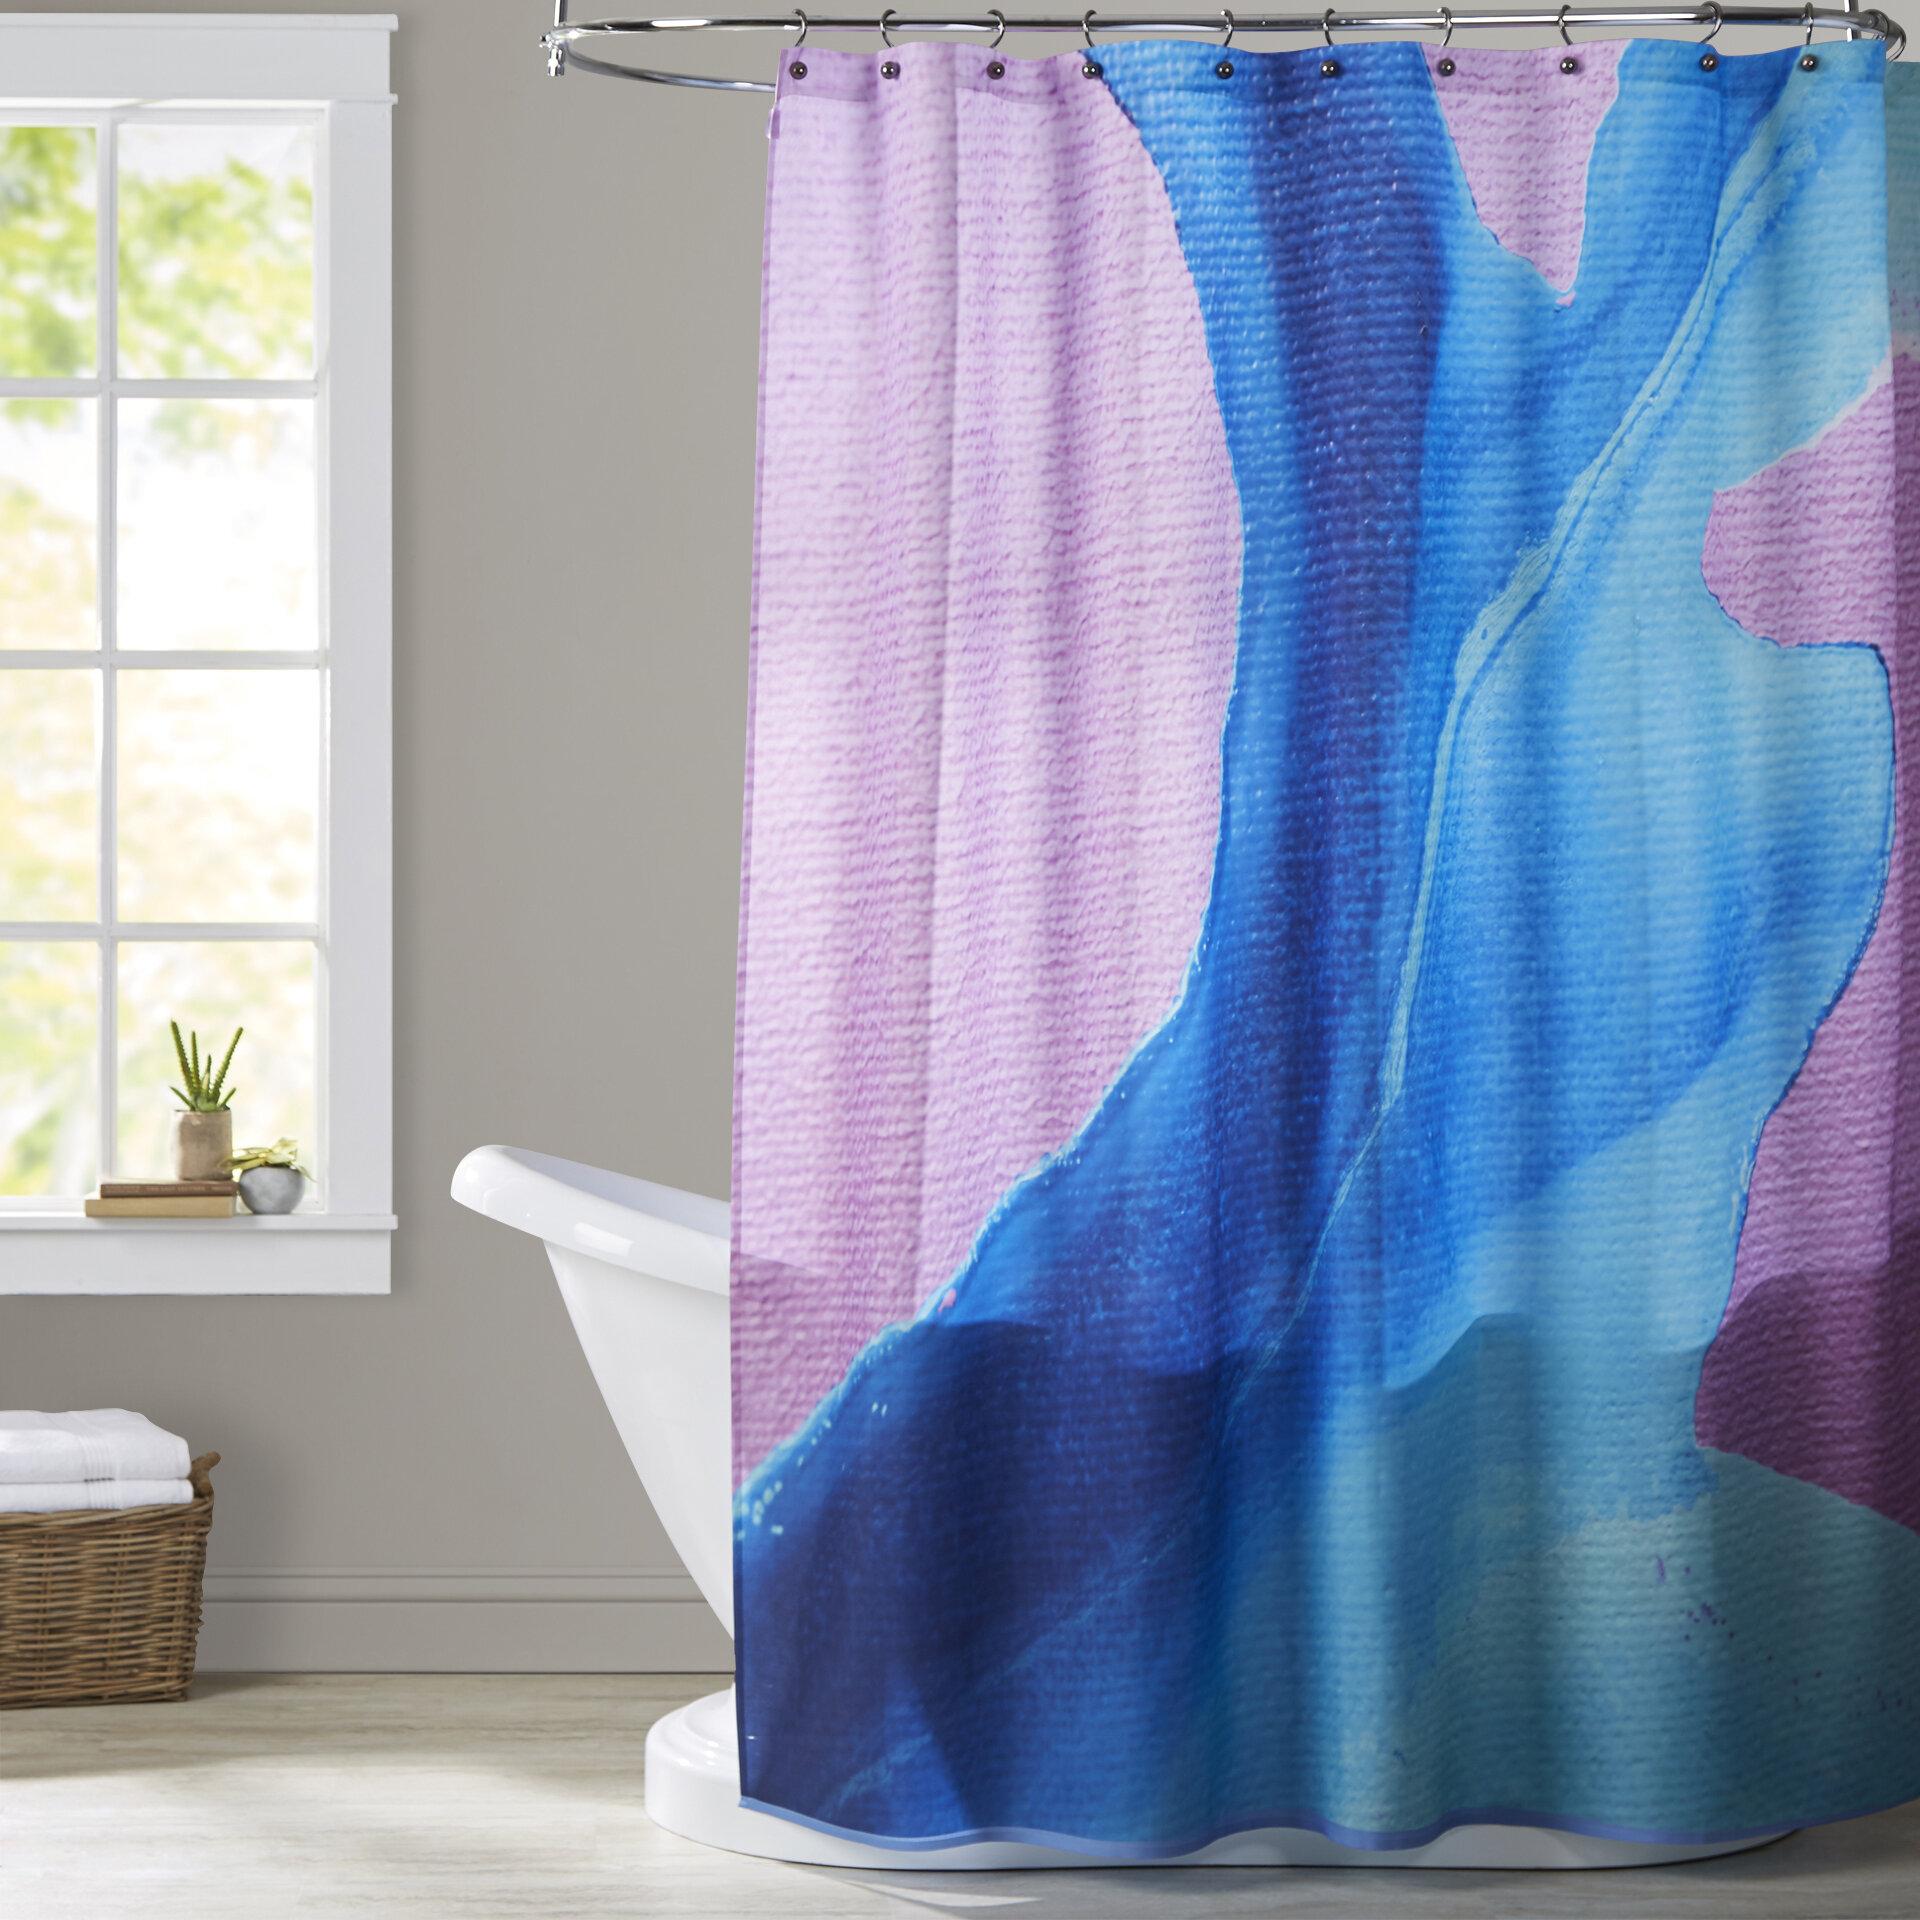 Brayden Studio Deb Mcnaughton Body Of Water Shower Curtain Reviews Wayfair